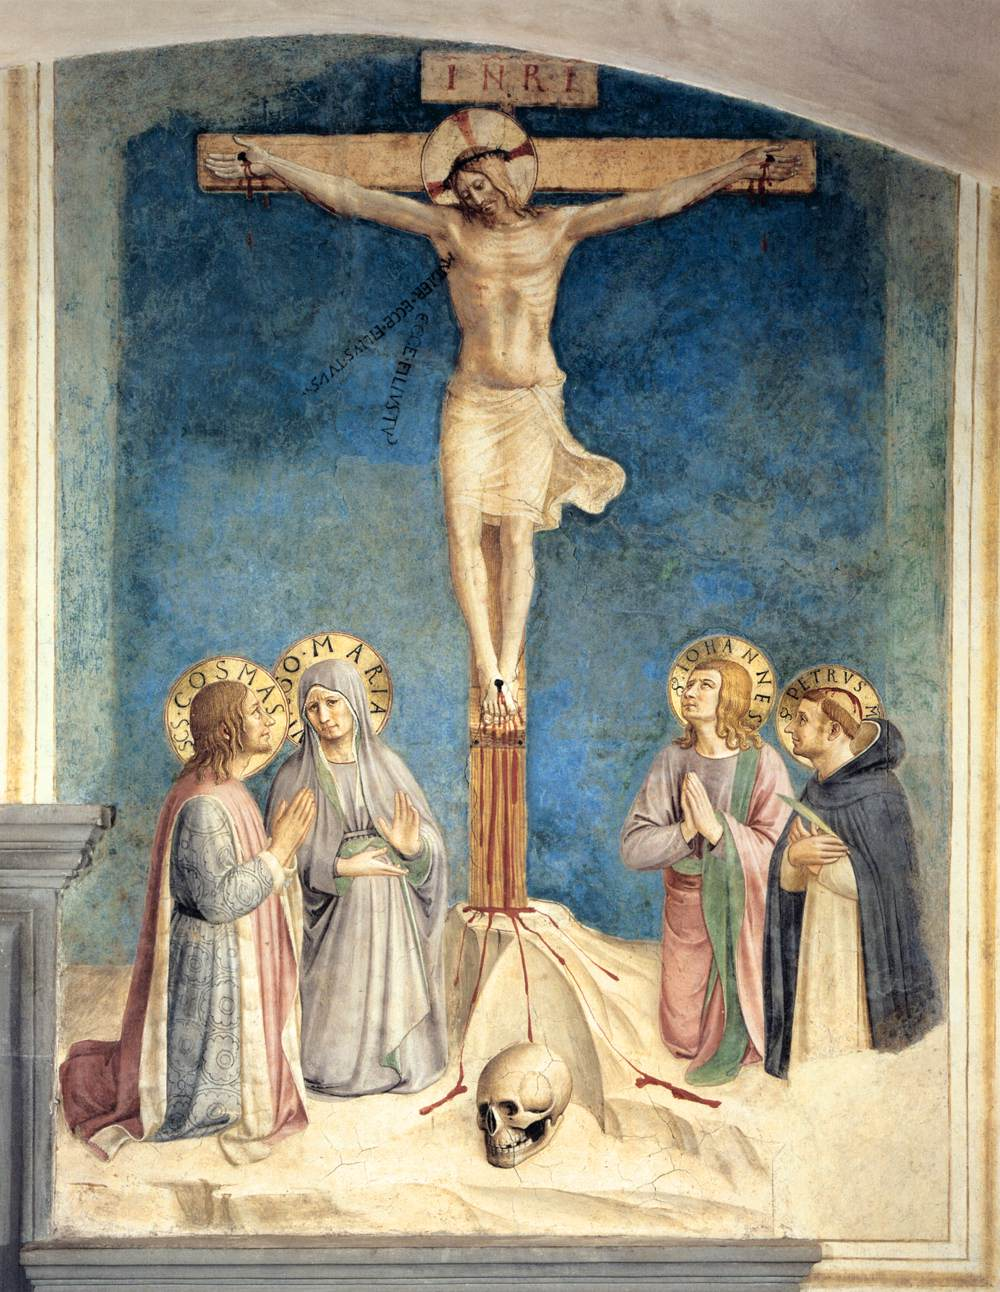 La Crucifixion, Fra Angelico, 1441-1442